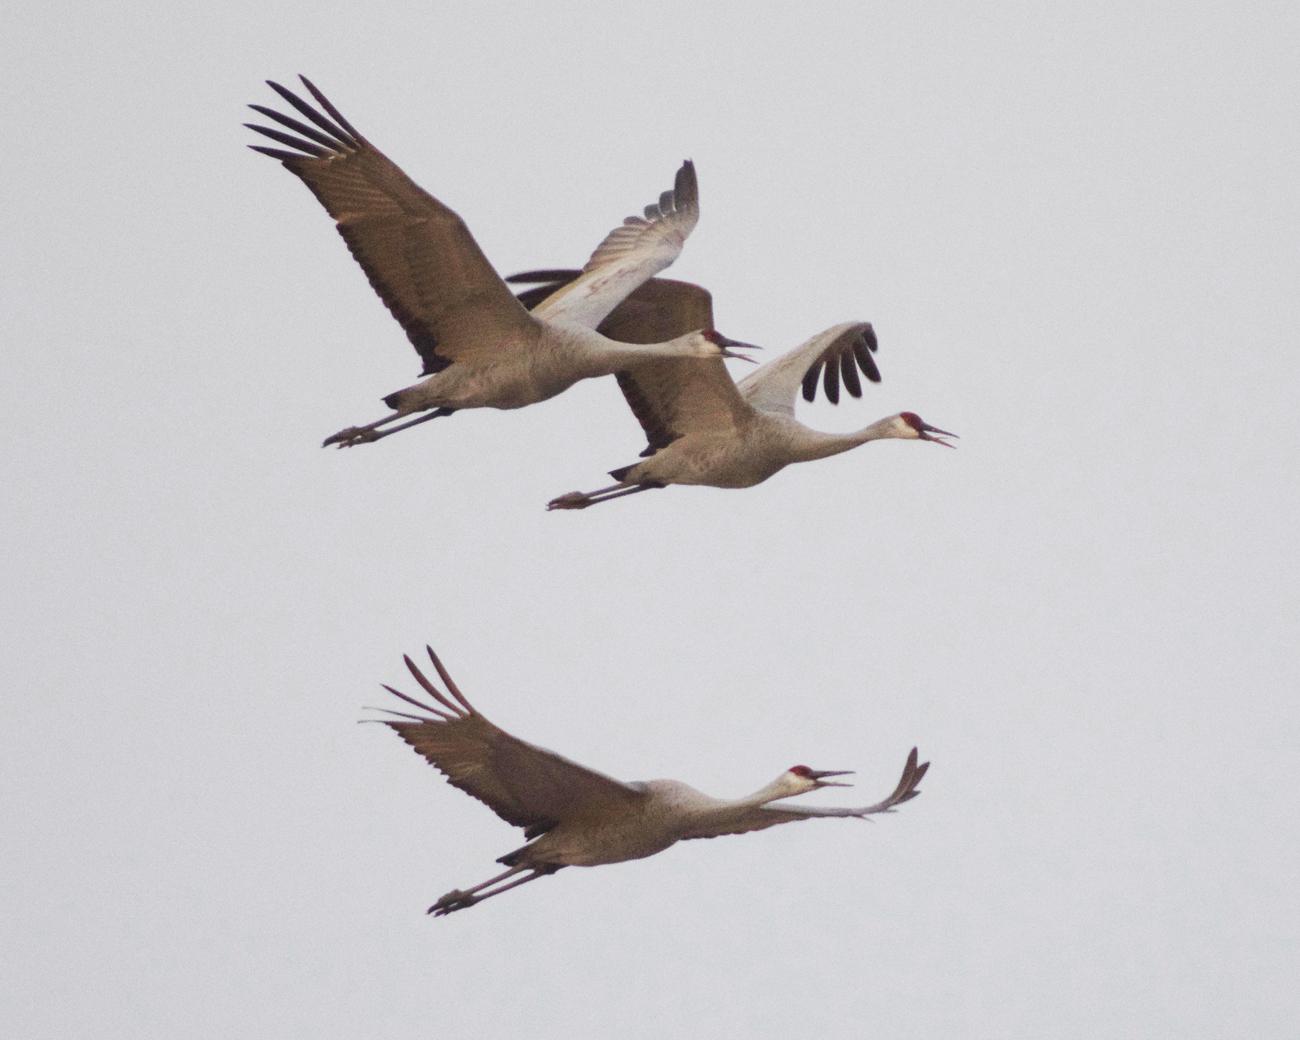 Three sandhill cranes up-close flying at Cibola